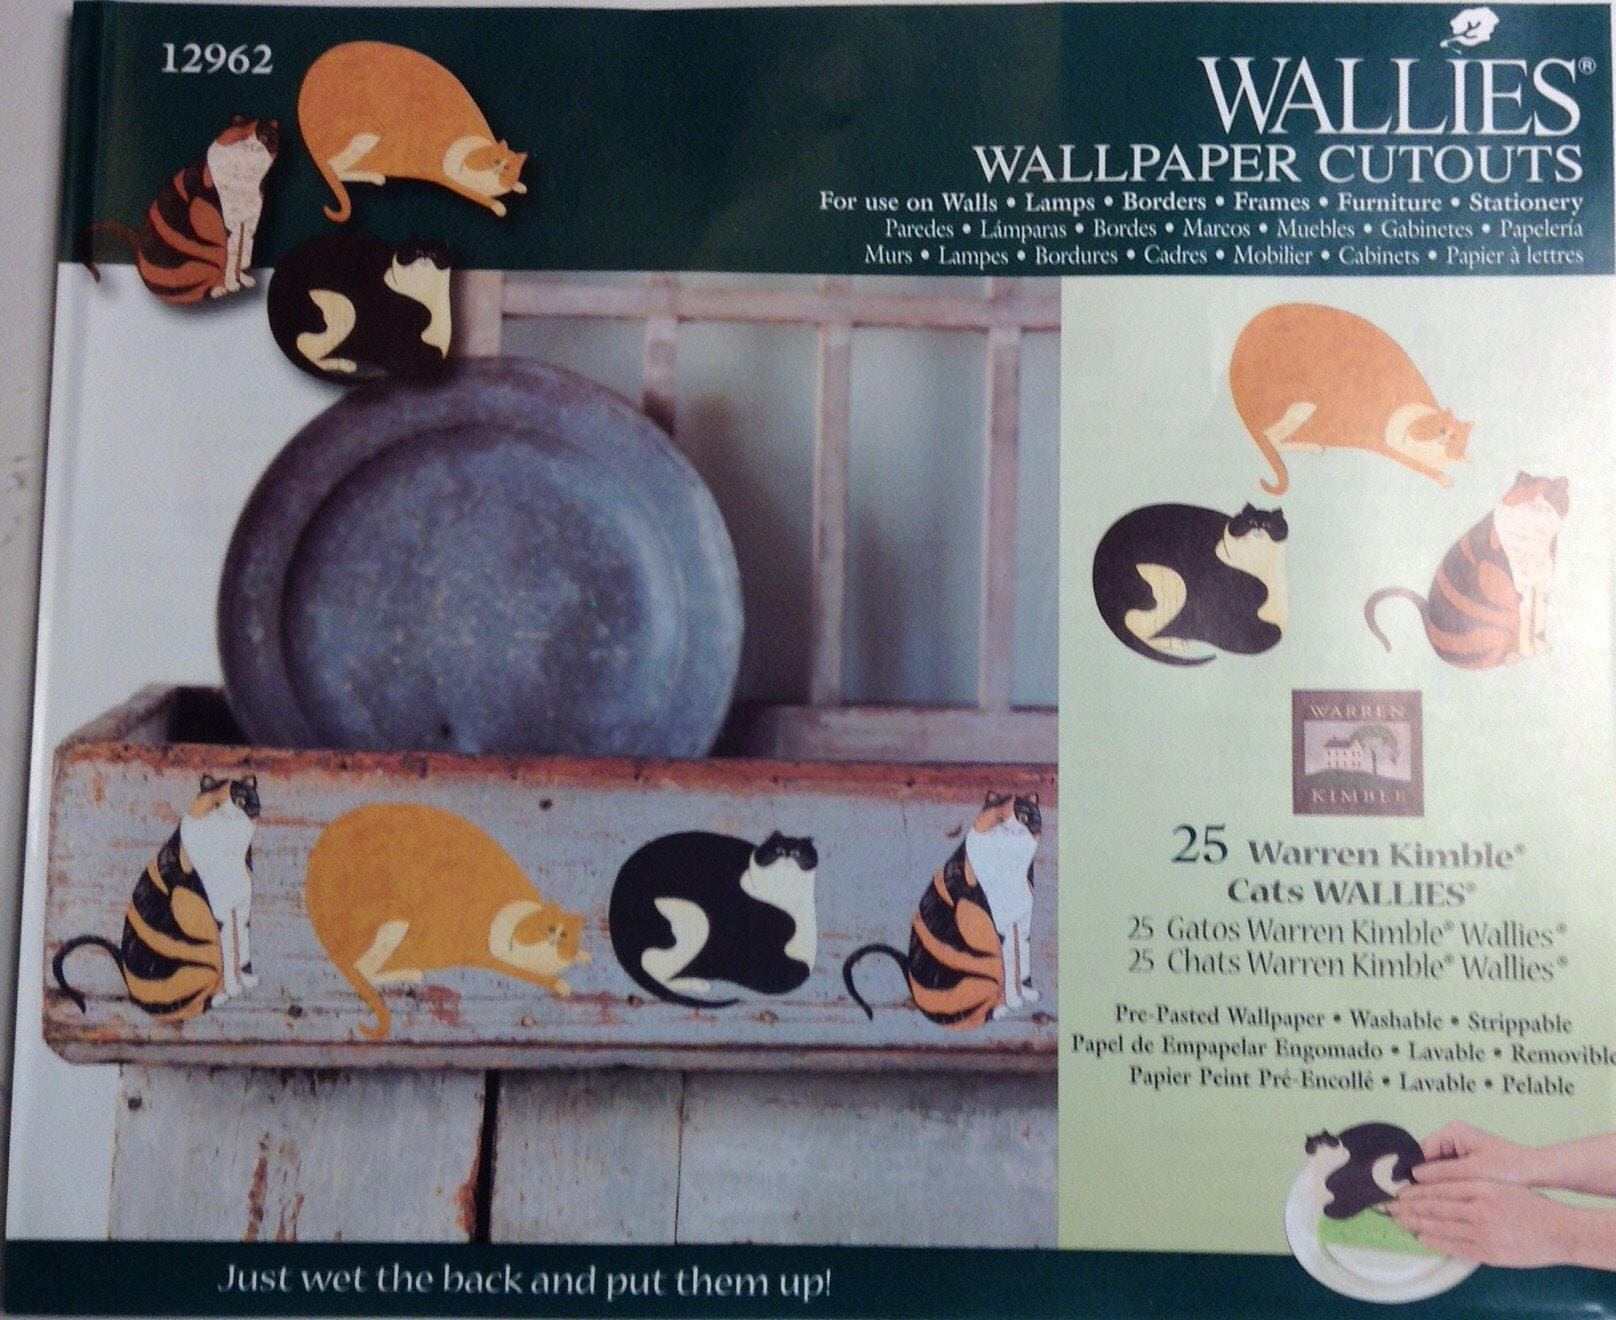 Wallies Cat Wallpaper Cutouts